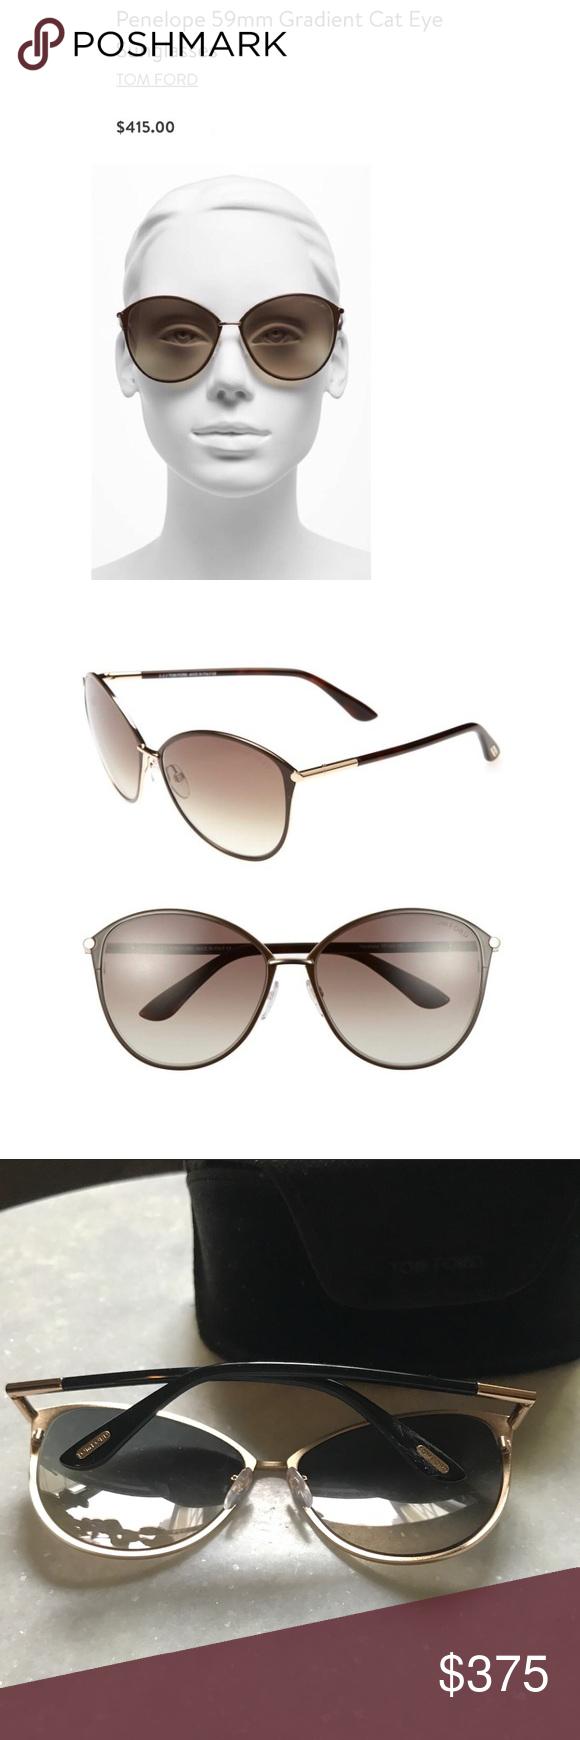 1e78861b77a Tom Ford Penelope Sunglasses Tom Ford Penelope sunglasses. NWOT ...